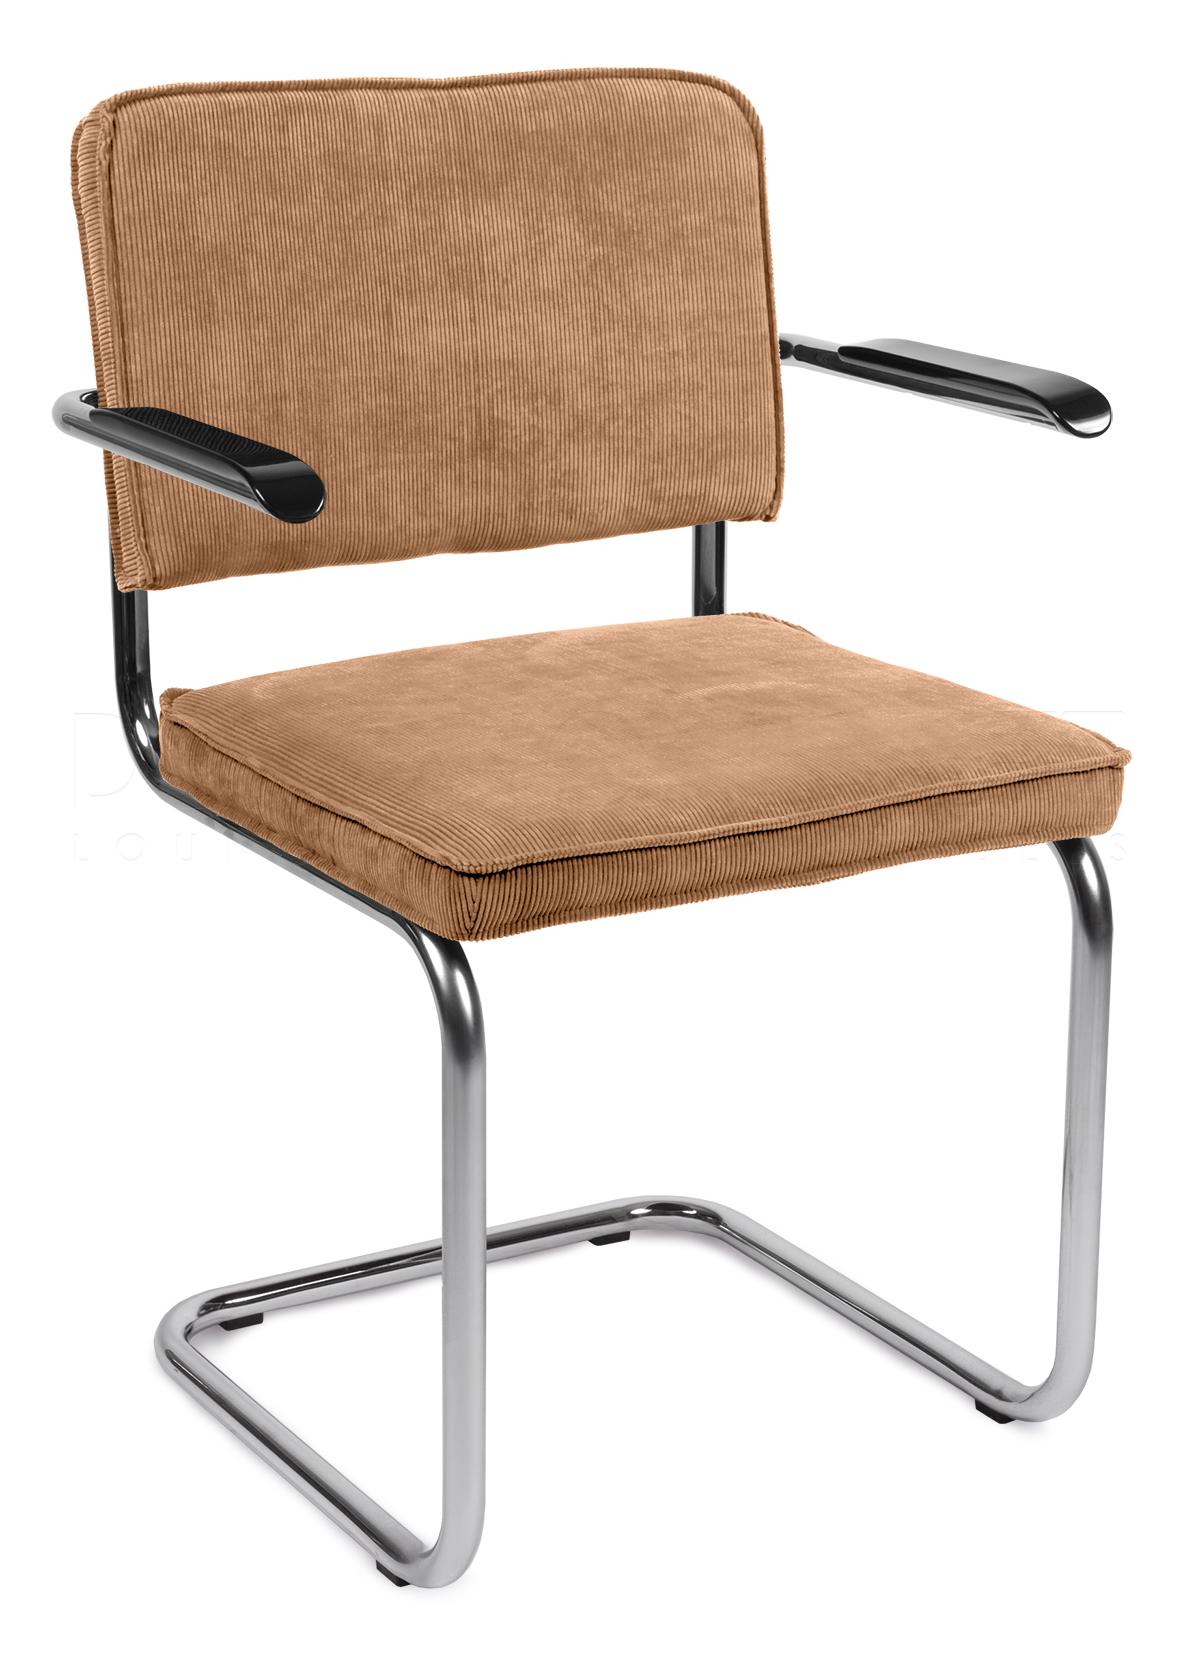 Image zuiver stoel ridge rib armleuning camel for Design stoel 24